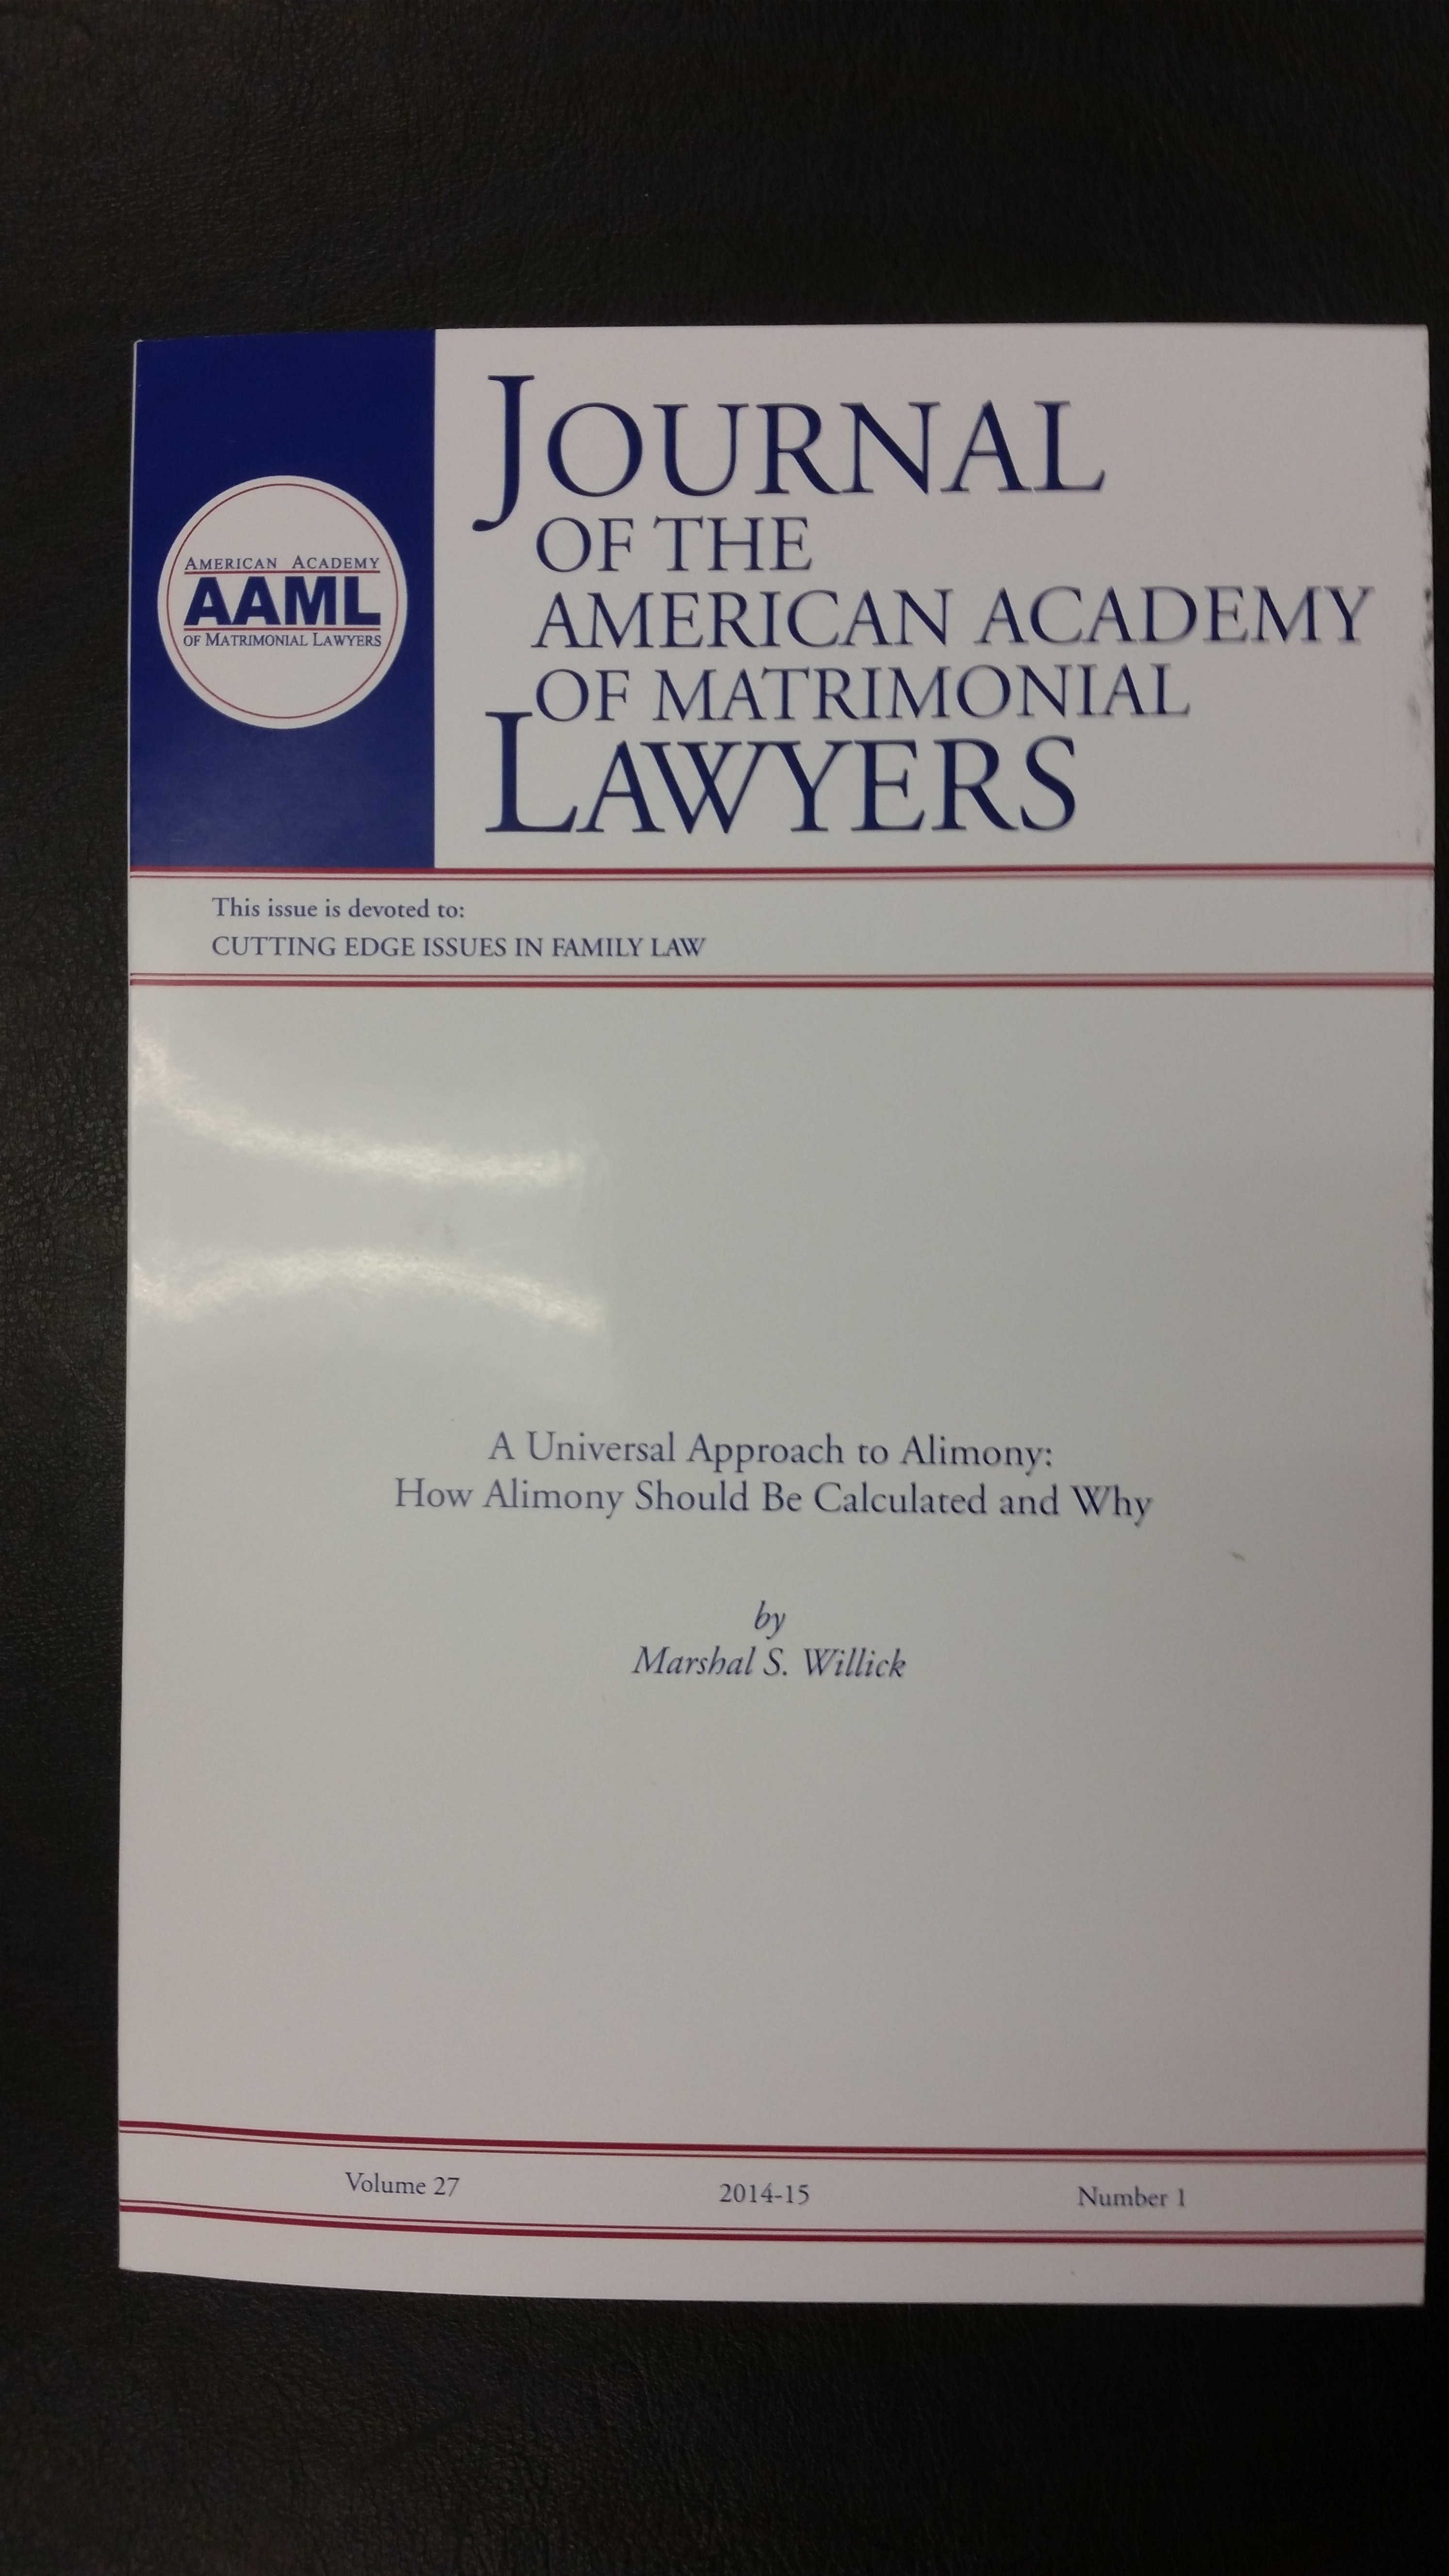 AAML Cover